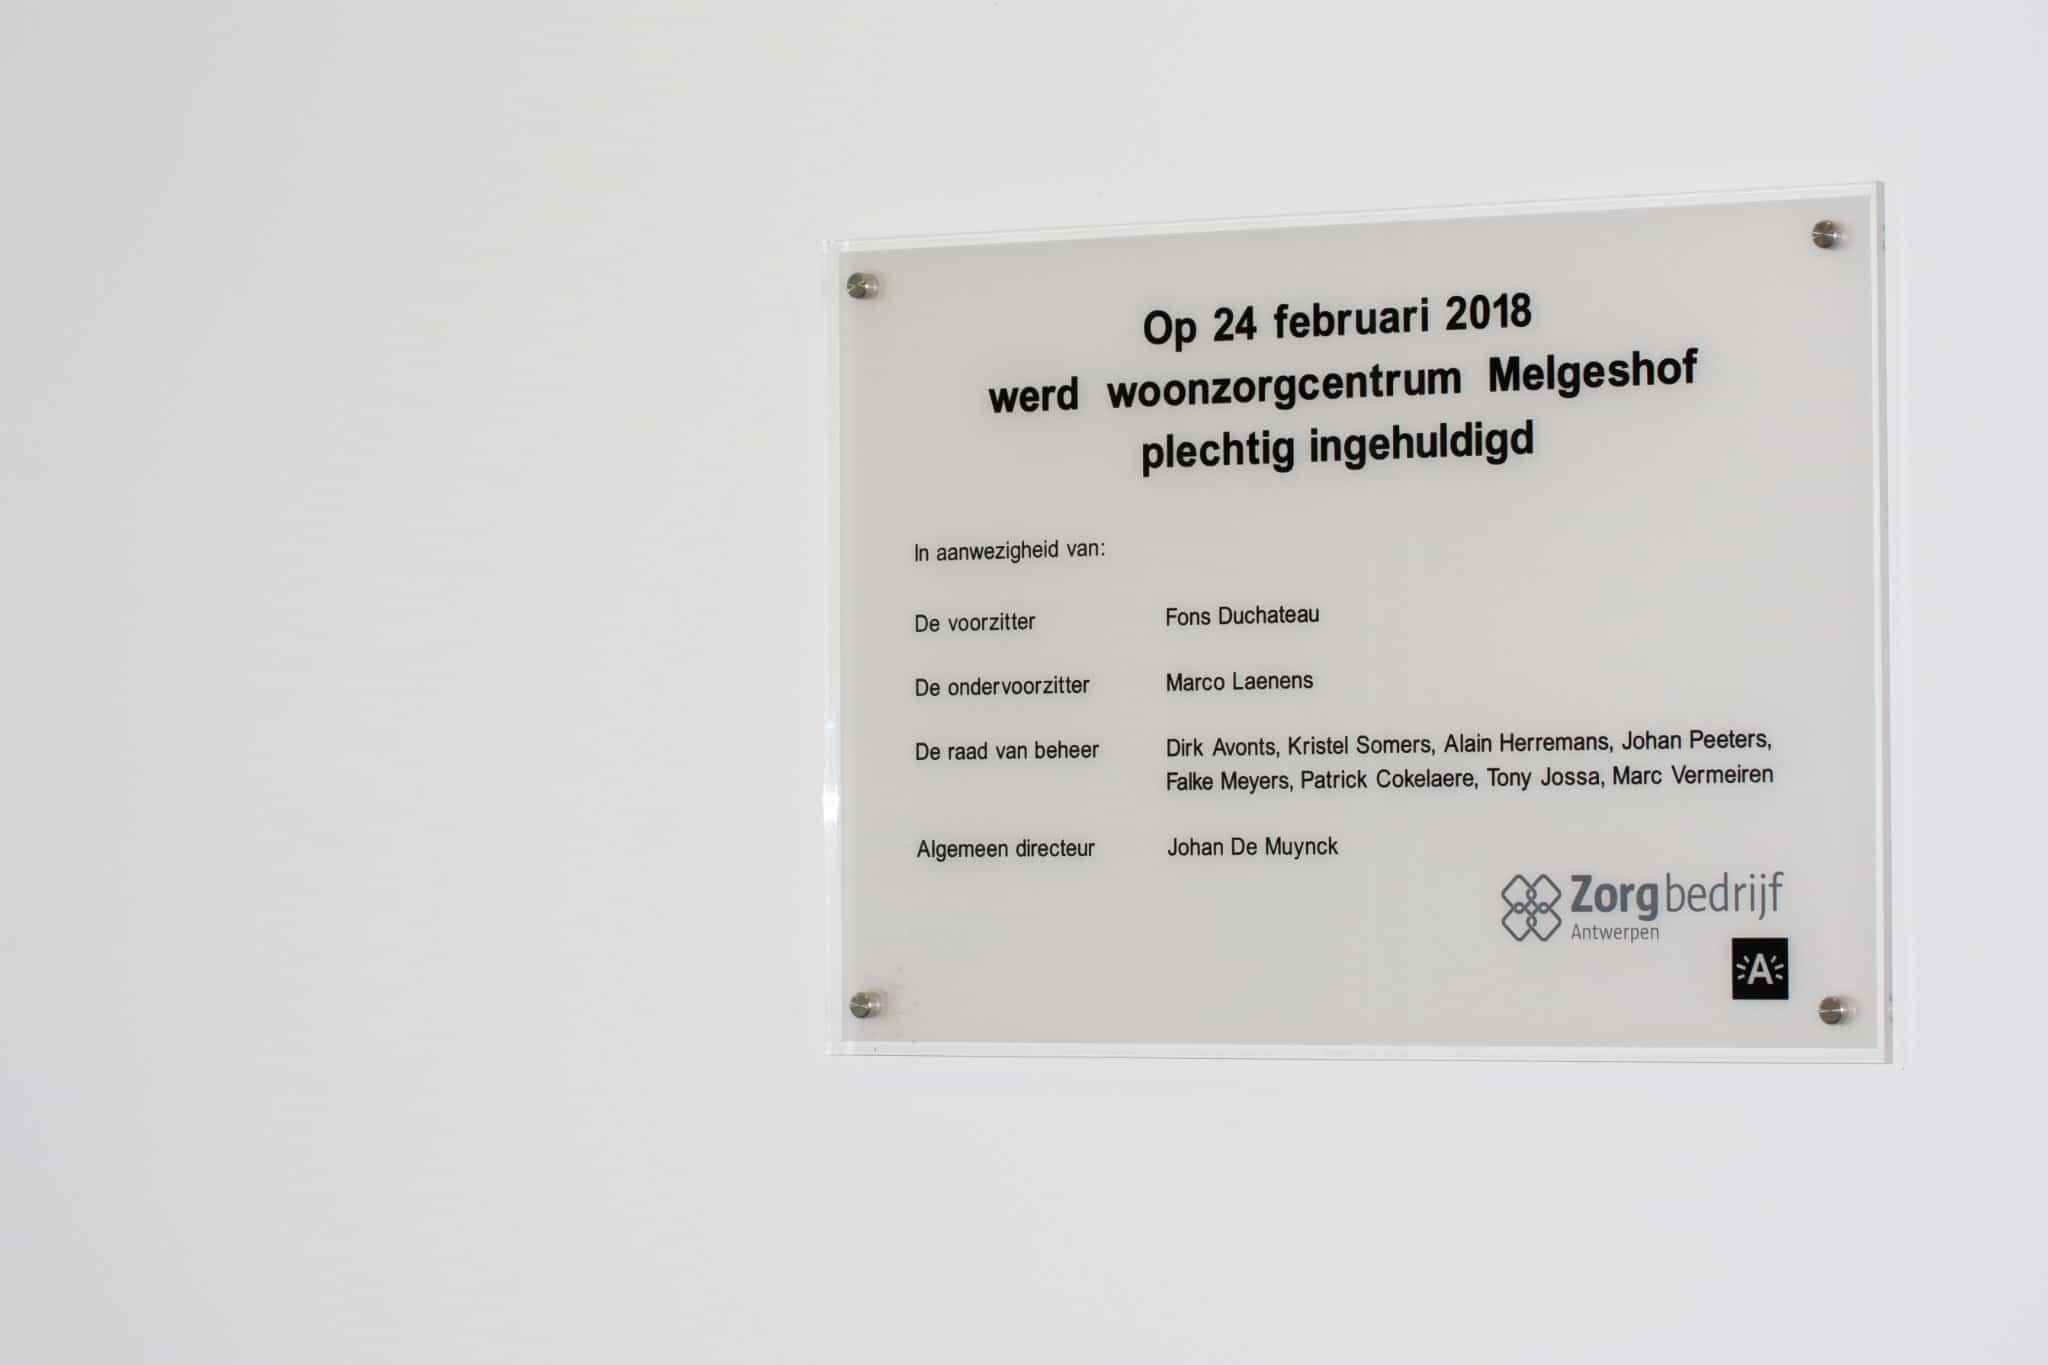 Zorgbedrijf Melgeshof - binnensignalisatie